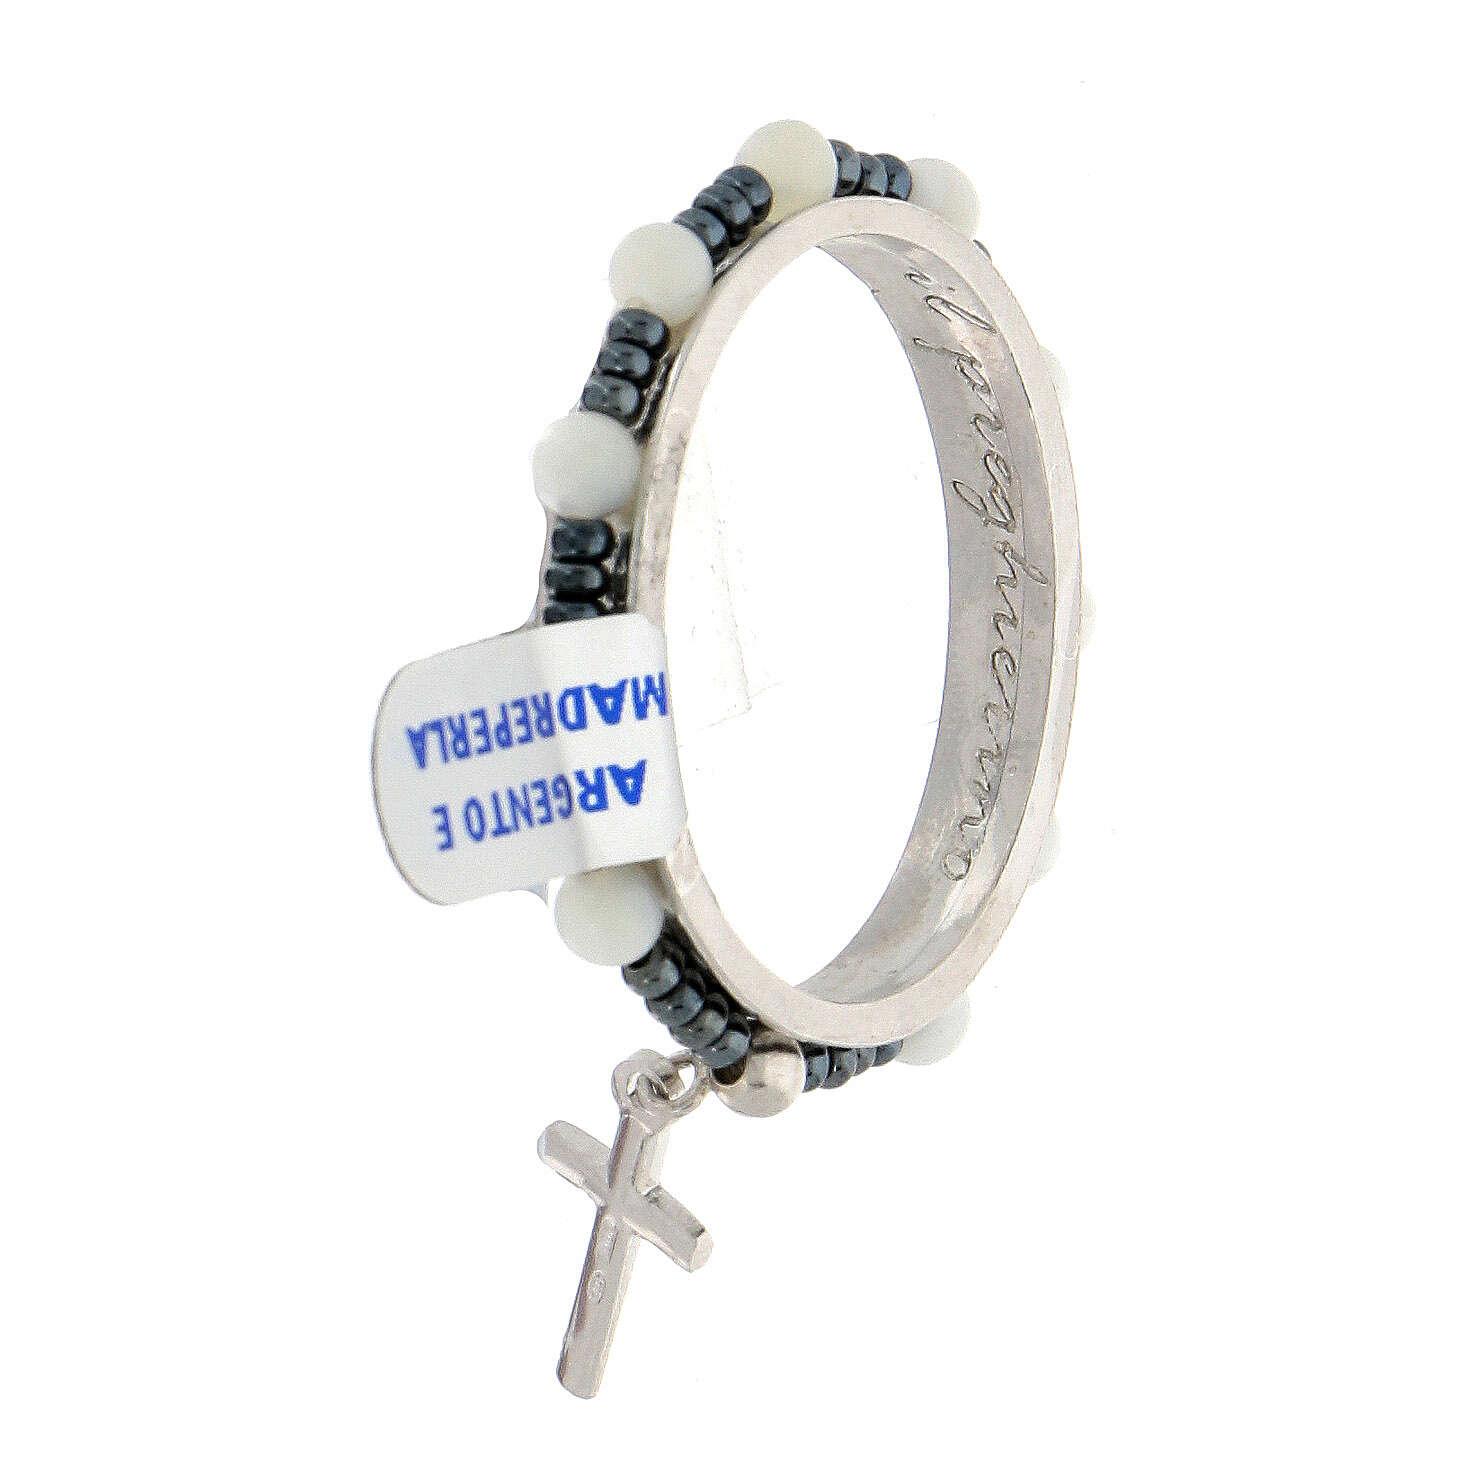 Preghierino argento 925 decina madreperla 4 mm croce pendente 4